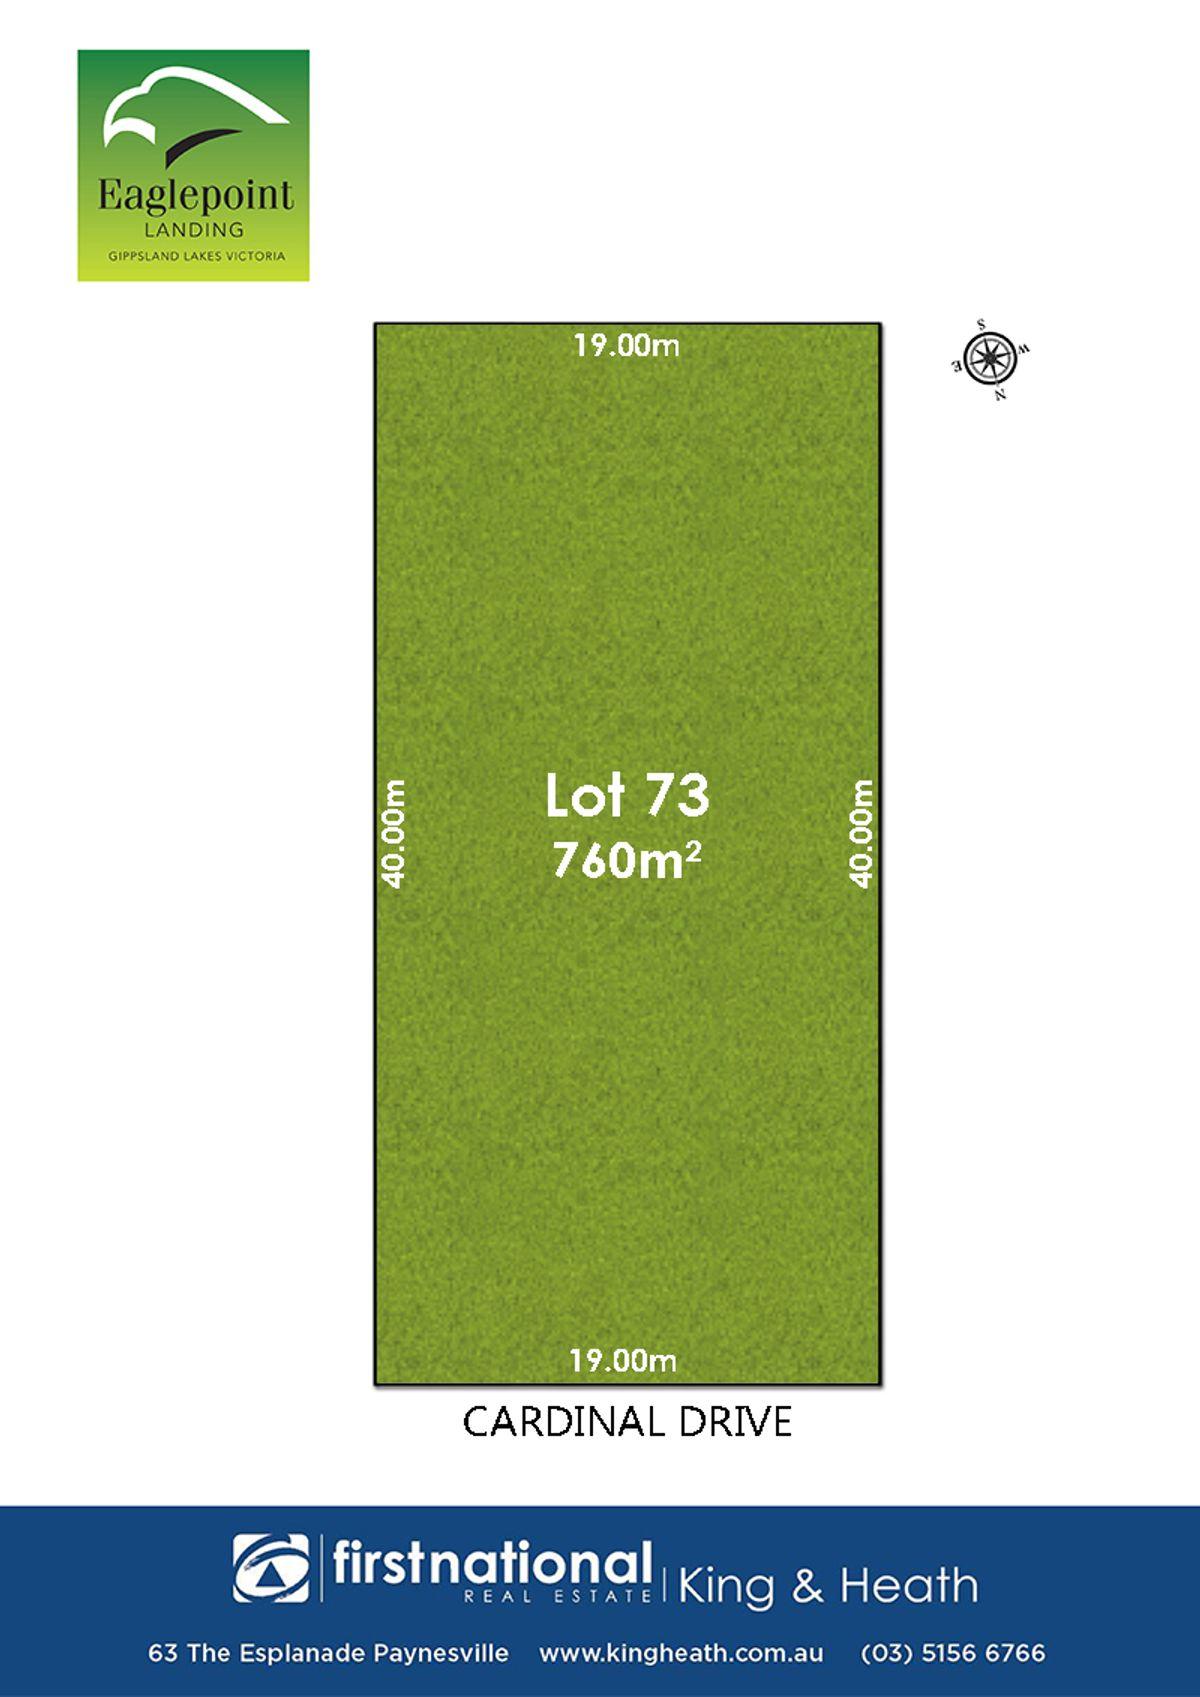 Lot 73, 42 Cardinal Drive, Eagle Point, VIC 3878